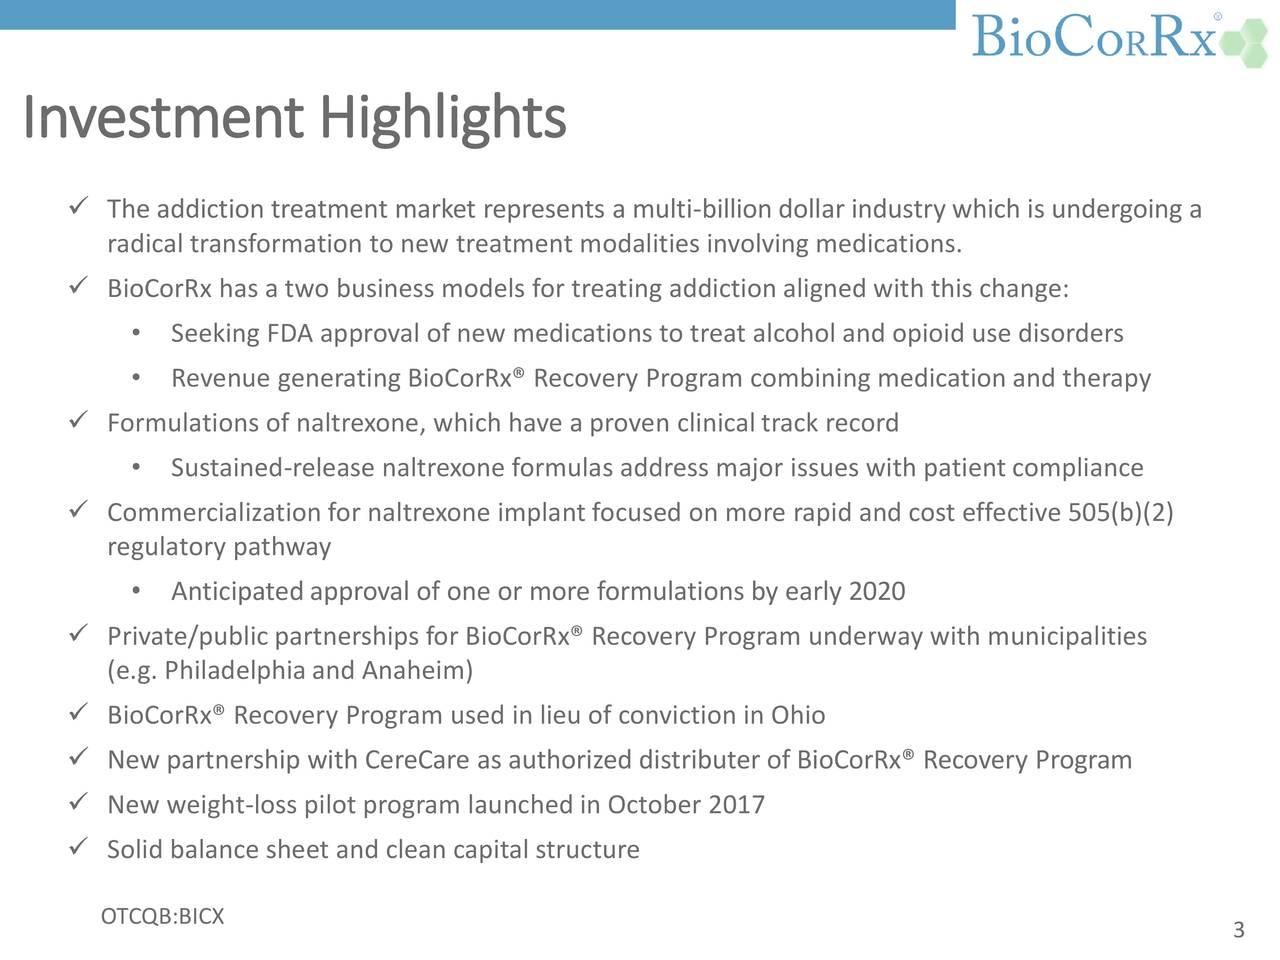 BioCorRx (BICX) Investor Presentation - Slideshow ...